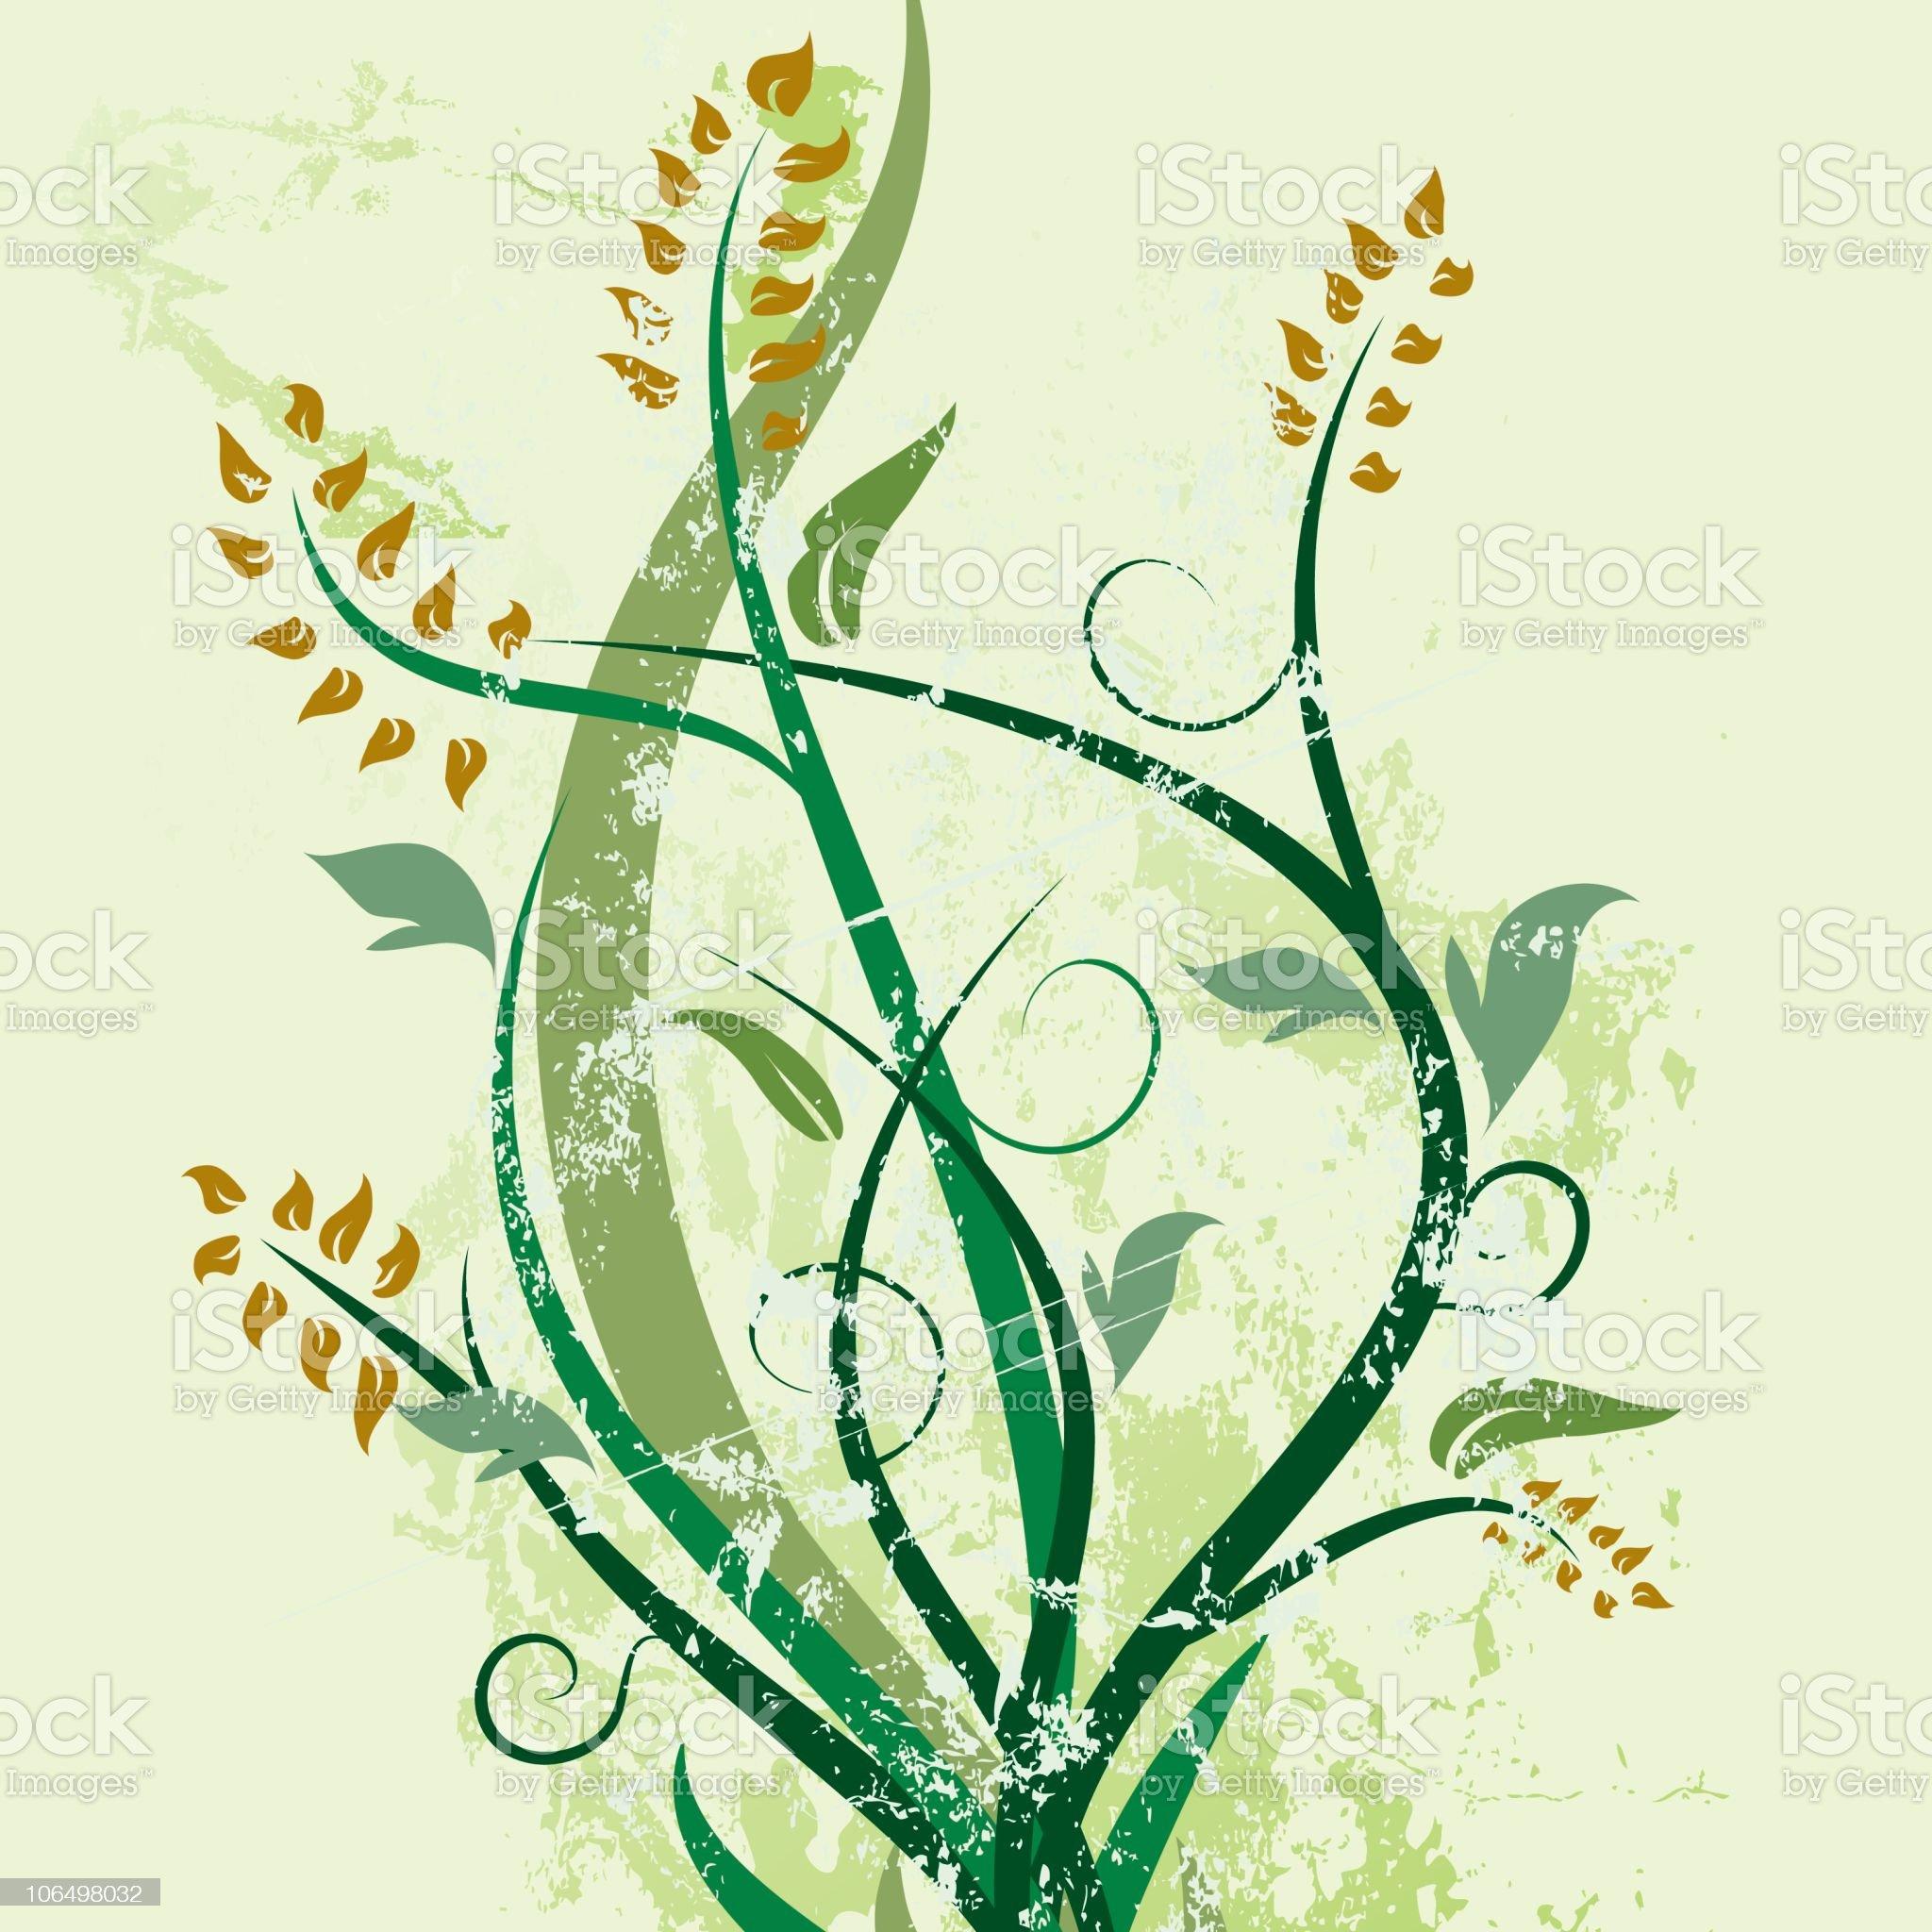 Green Spring Embellishment royalty-free stock vector art